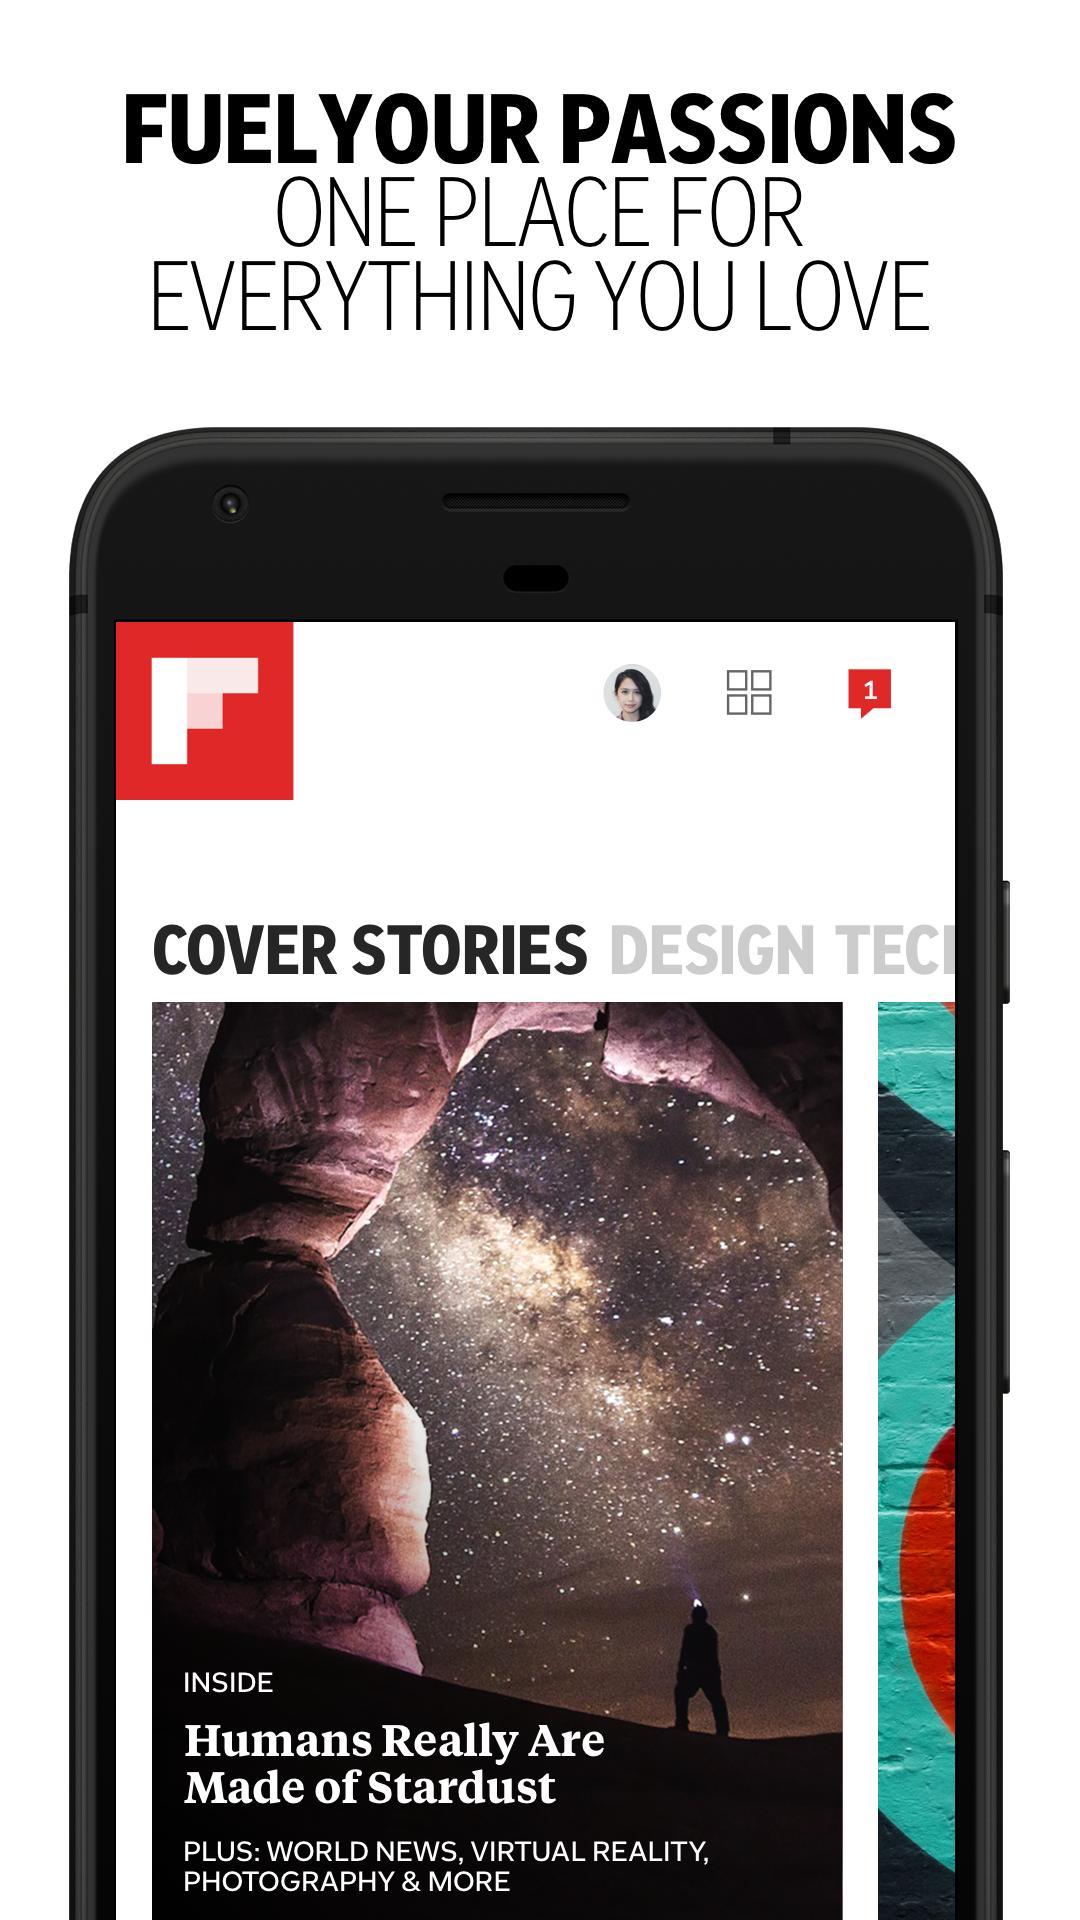 Flipboard Latest News, Top Stories & Lifestyle 4.2.59 Screenshot 1